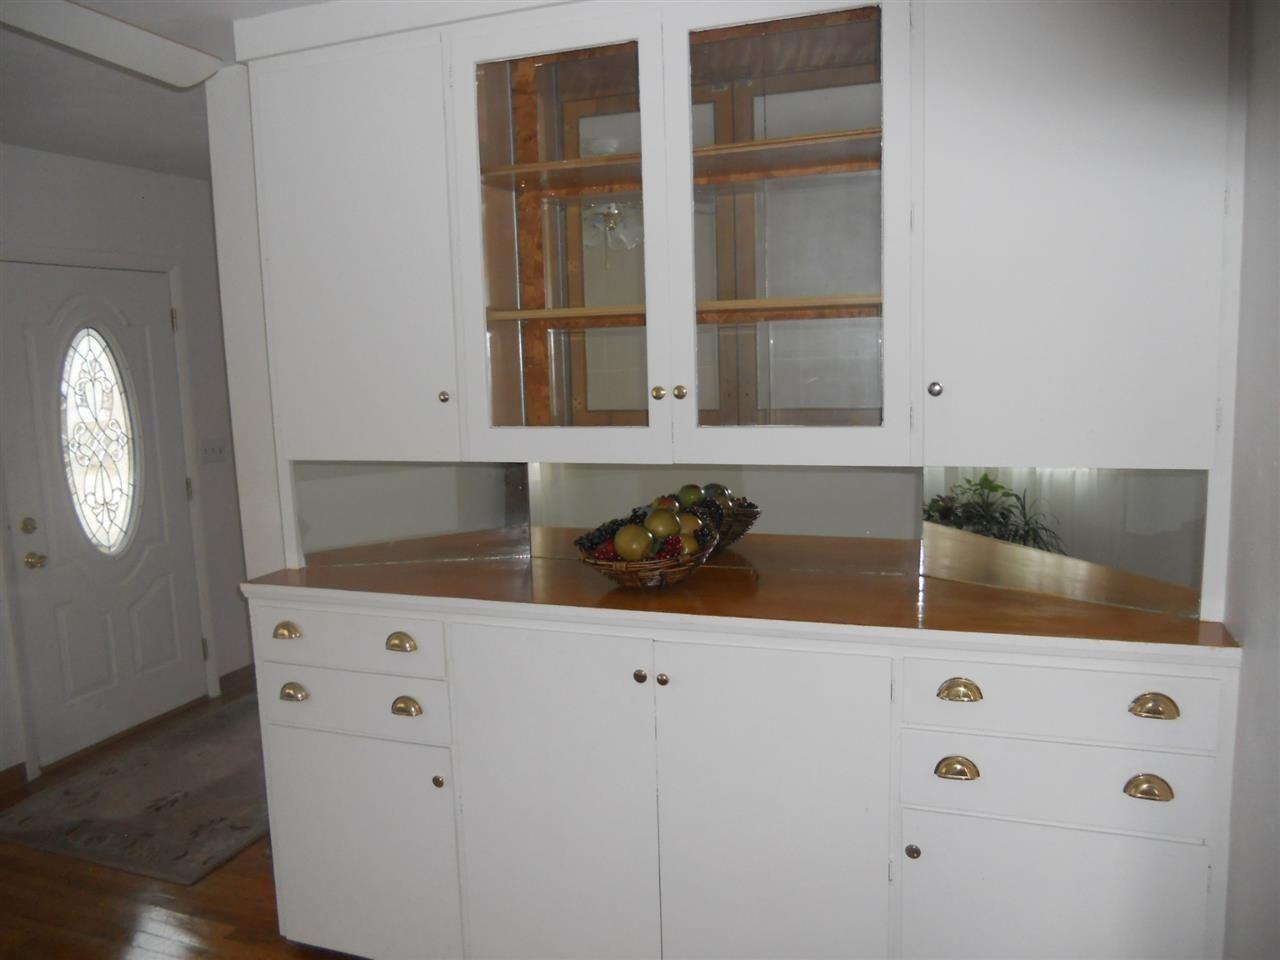 kitchen cabinets | Iowa real estate, Kitchen cabinets, Home